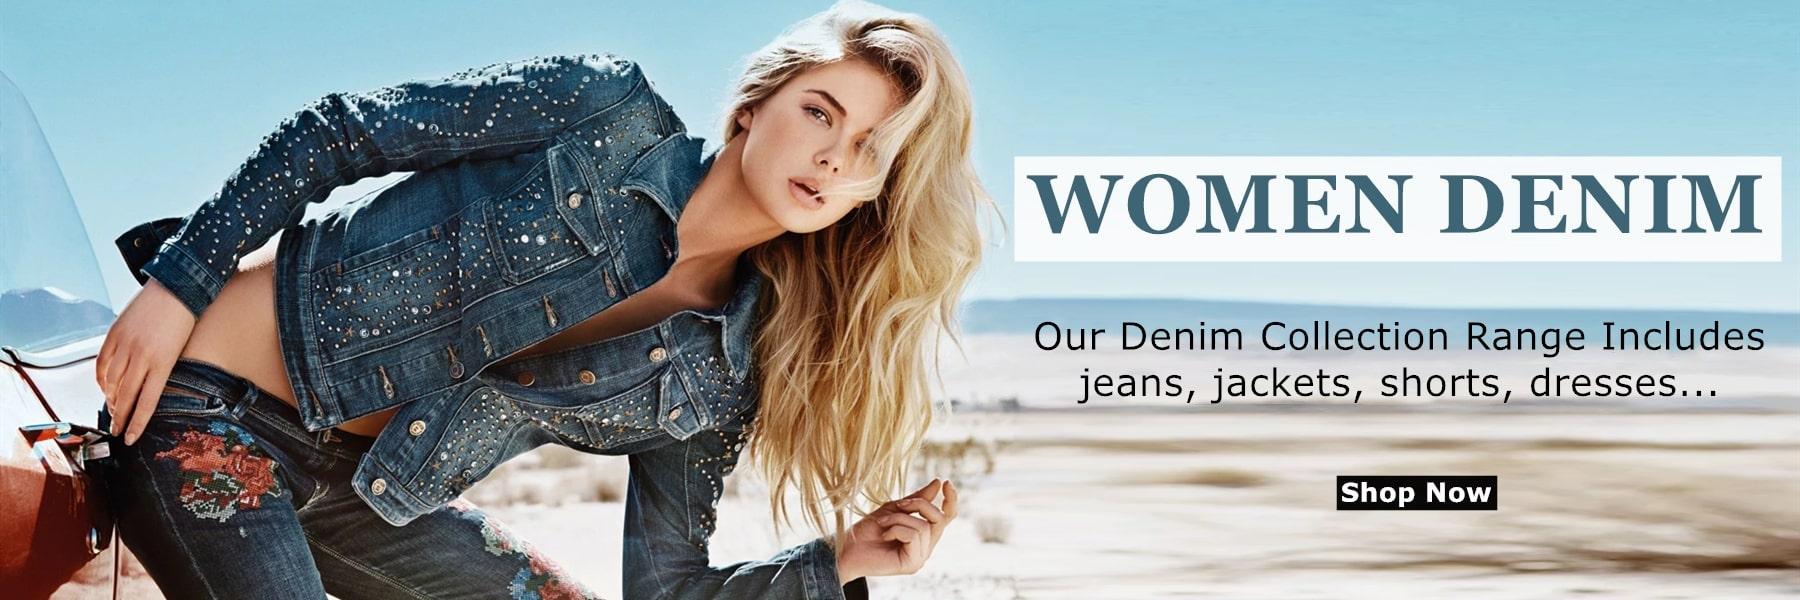 Wholesale Women Denim Clothing